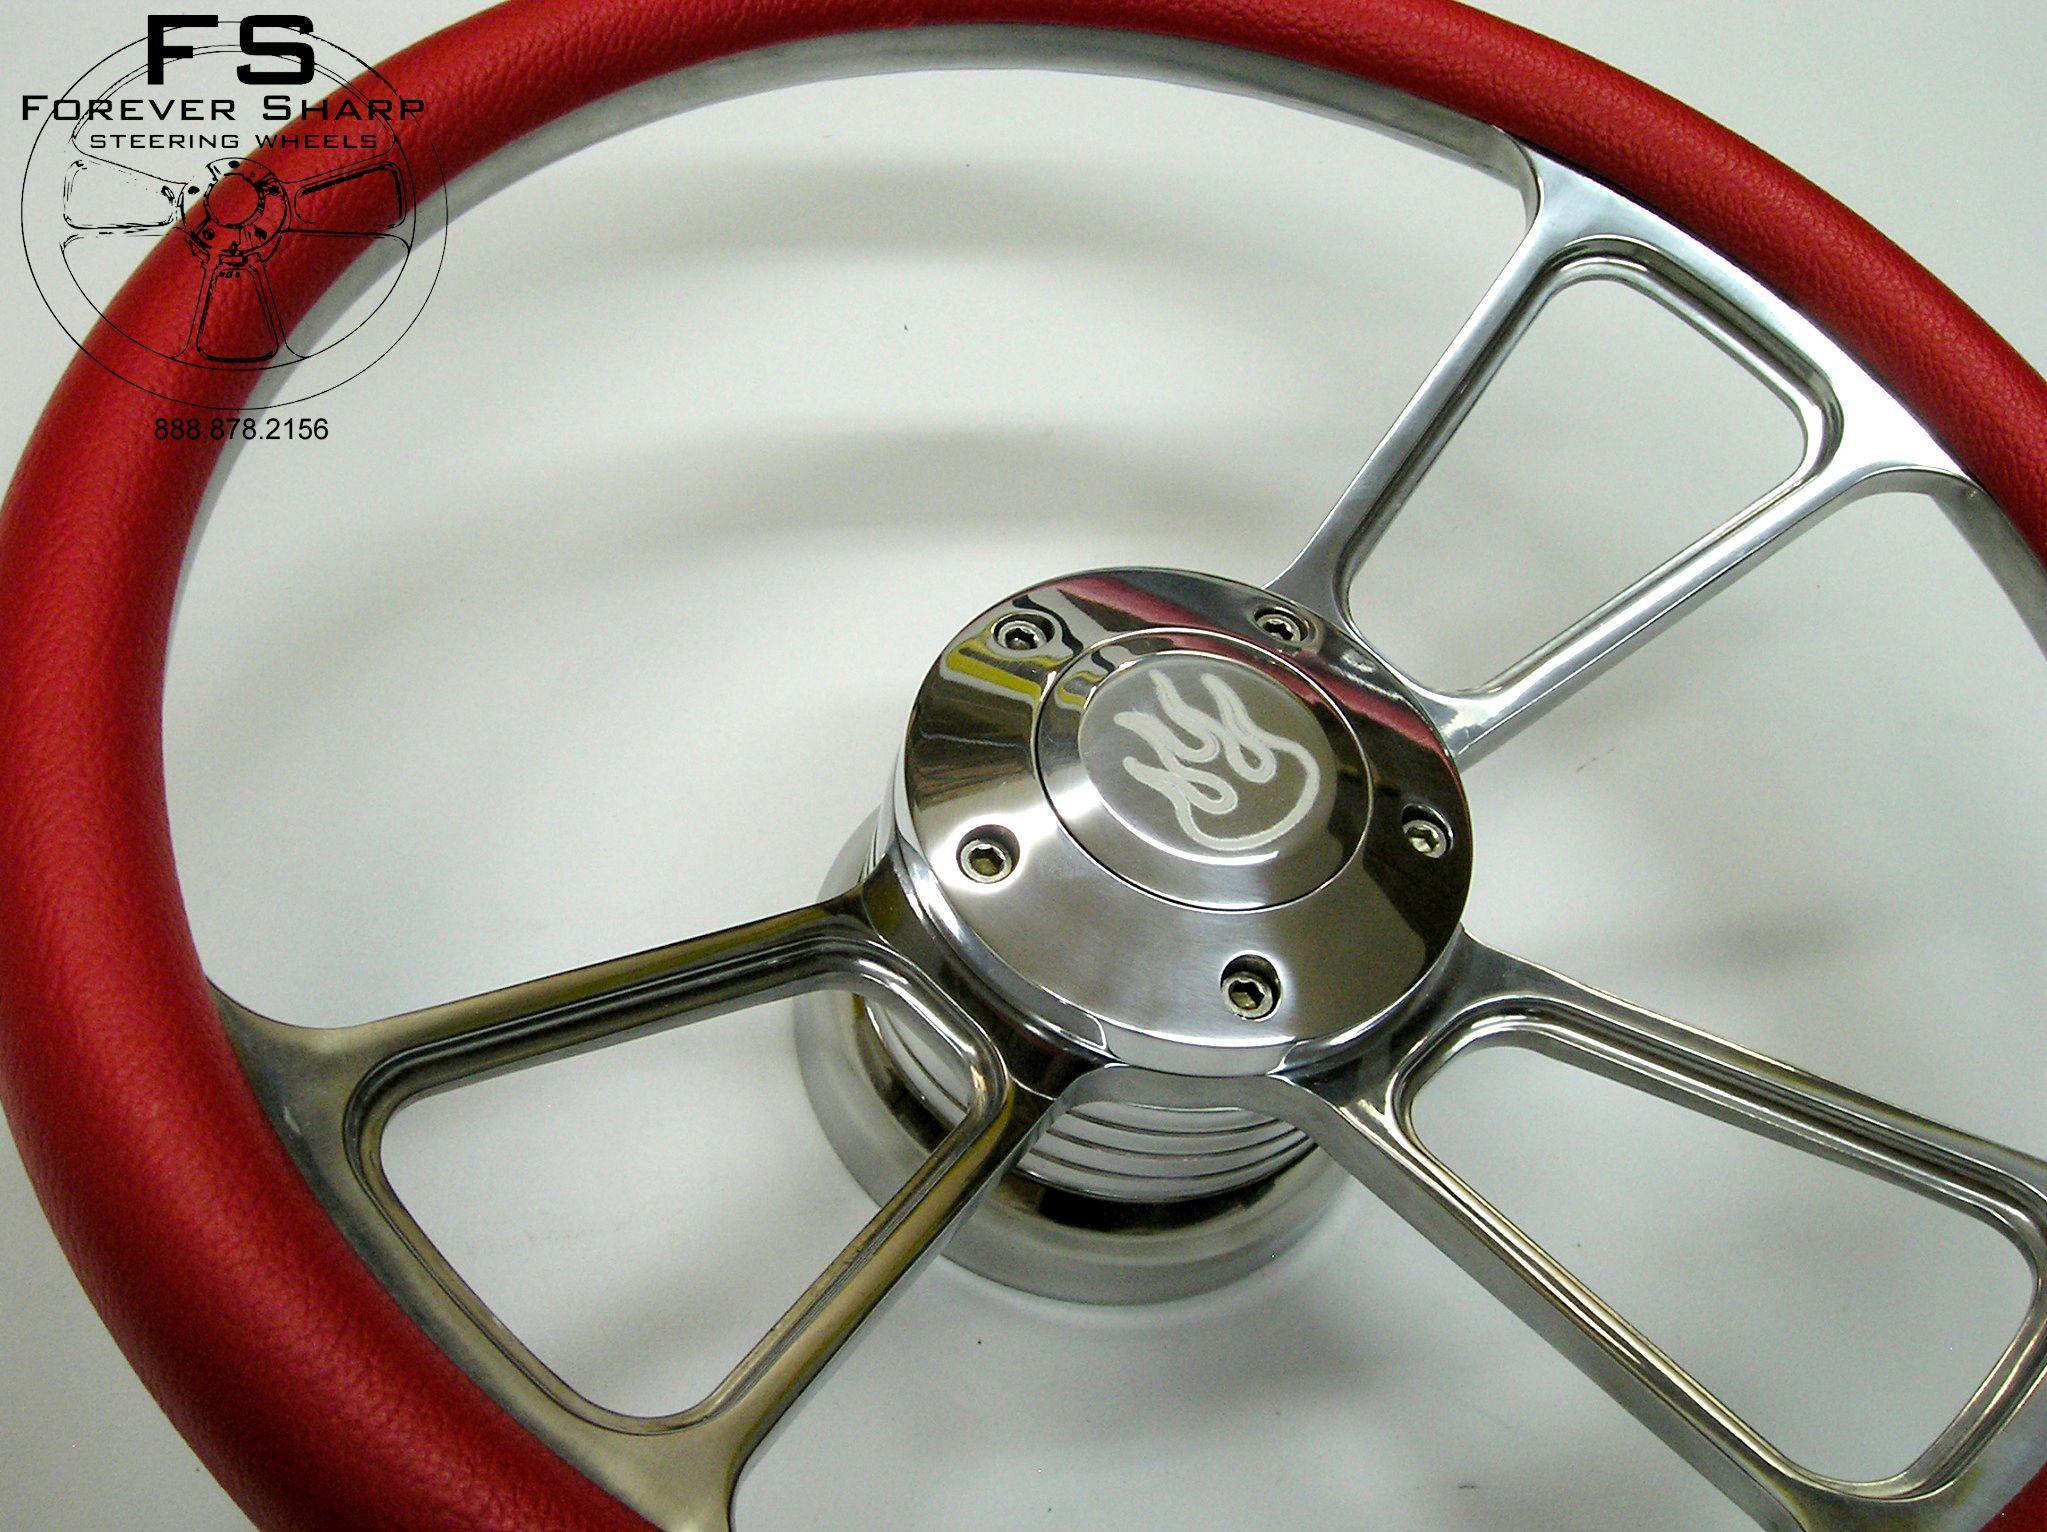 84UP Club Car Golf Cart Billet Steering Wheel Red Flame